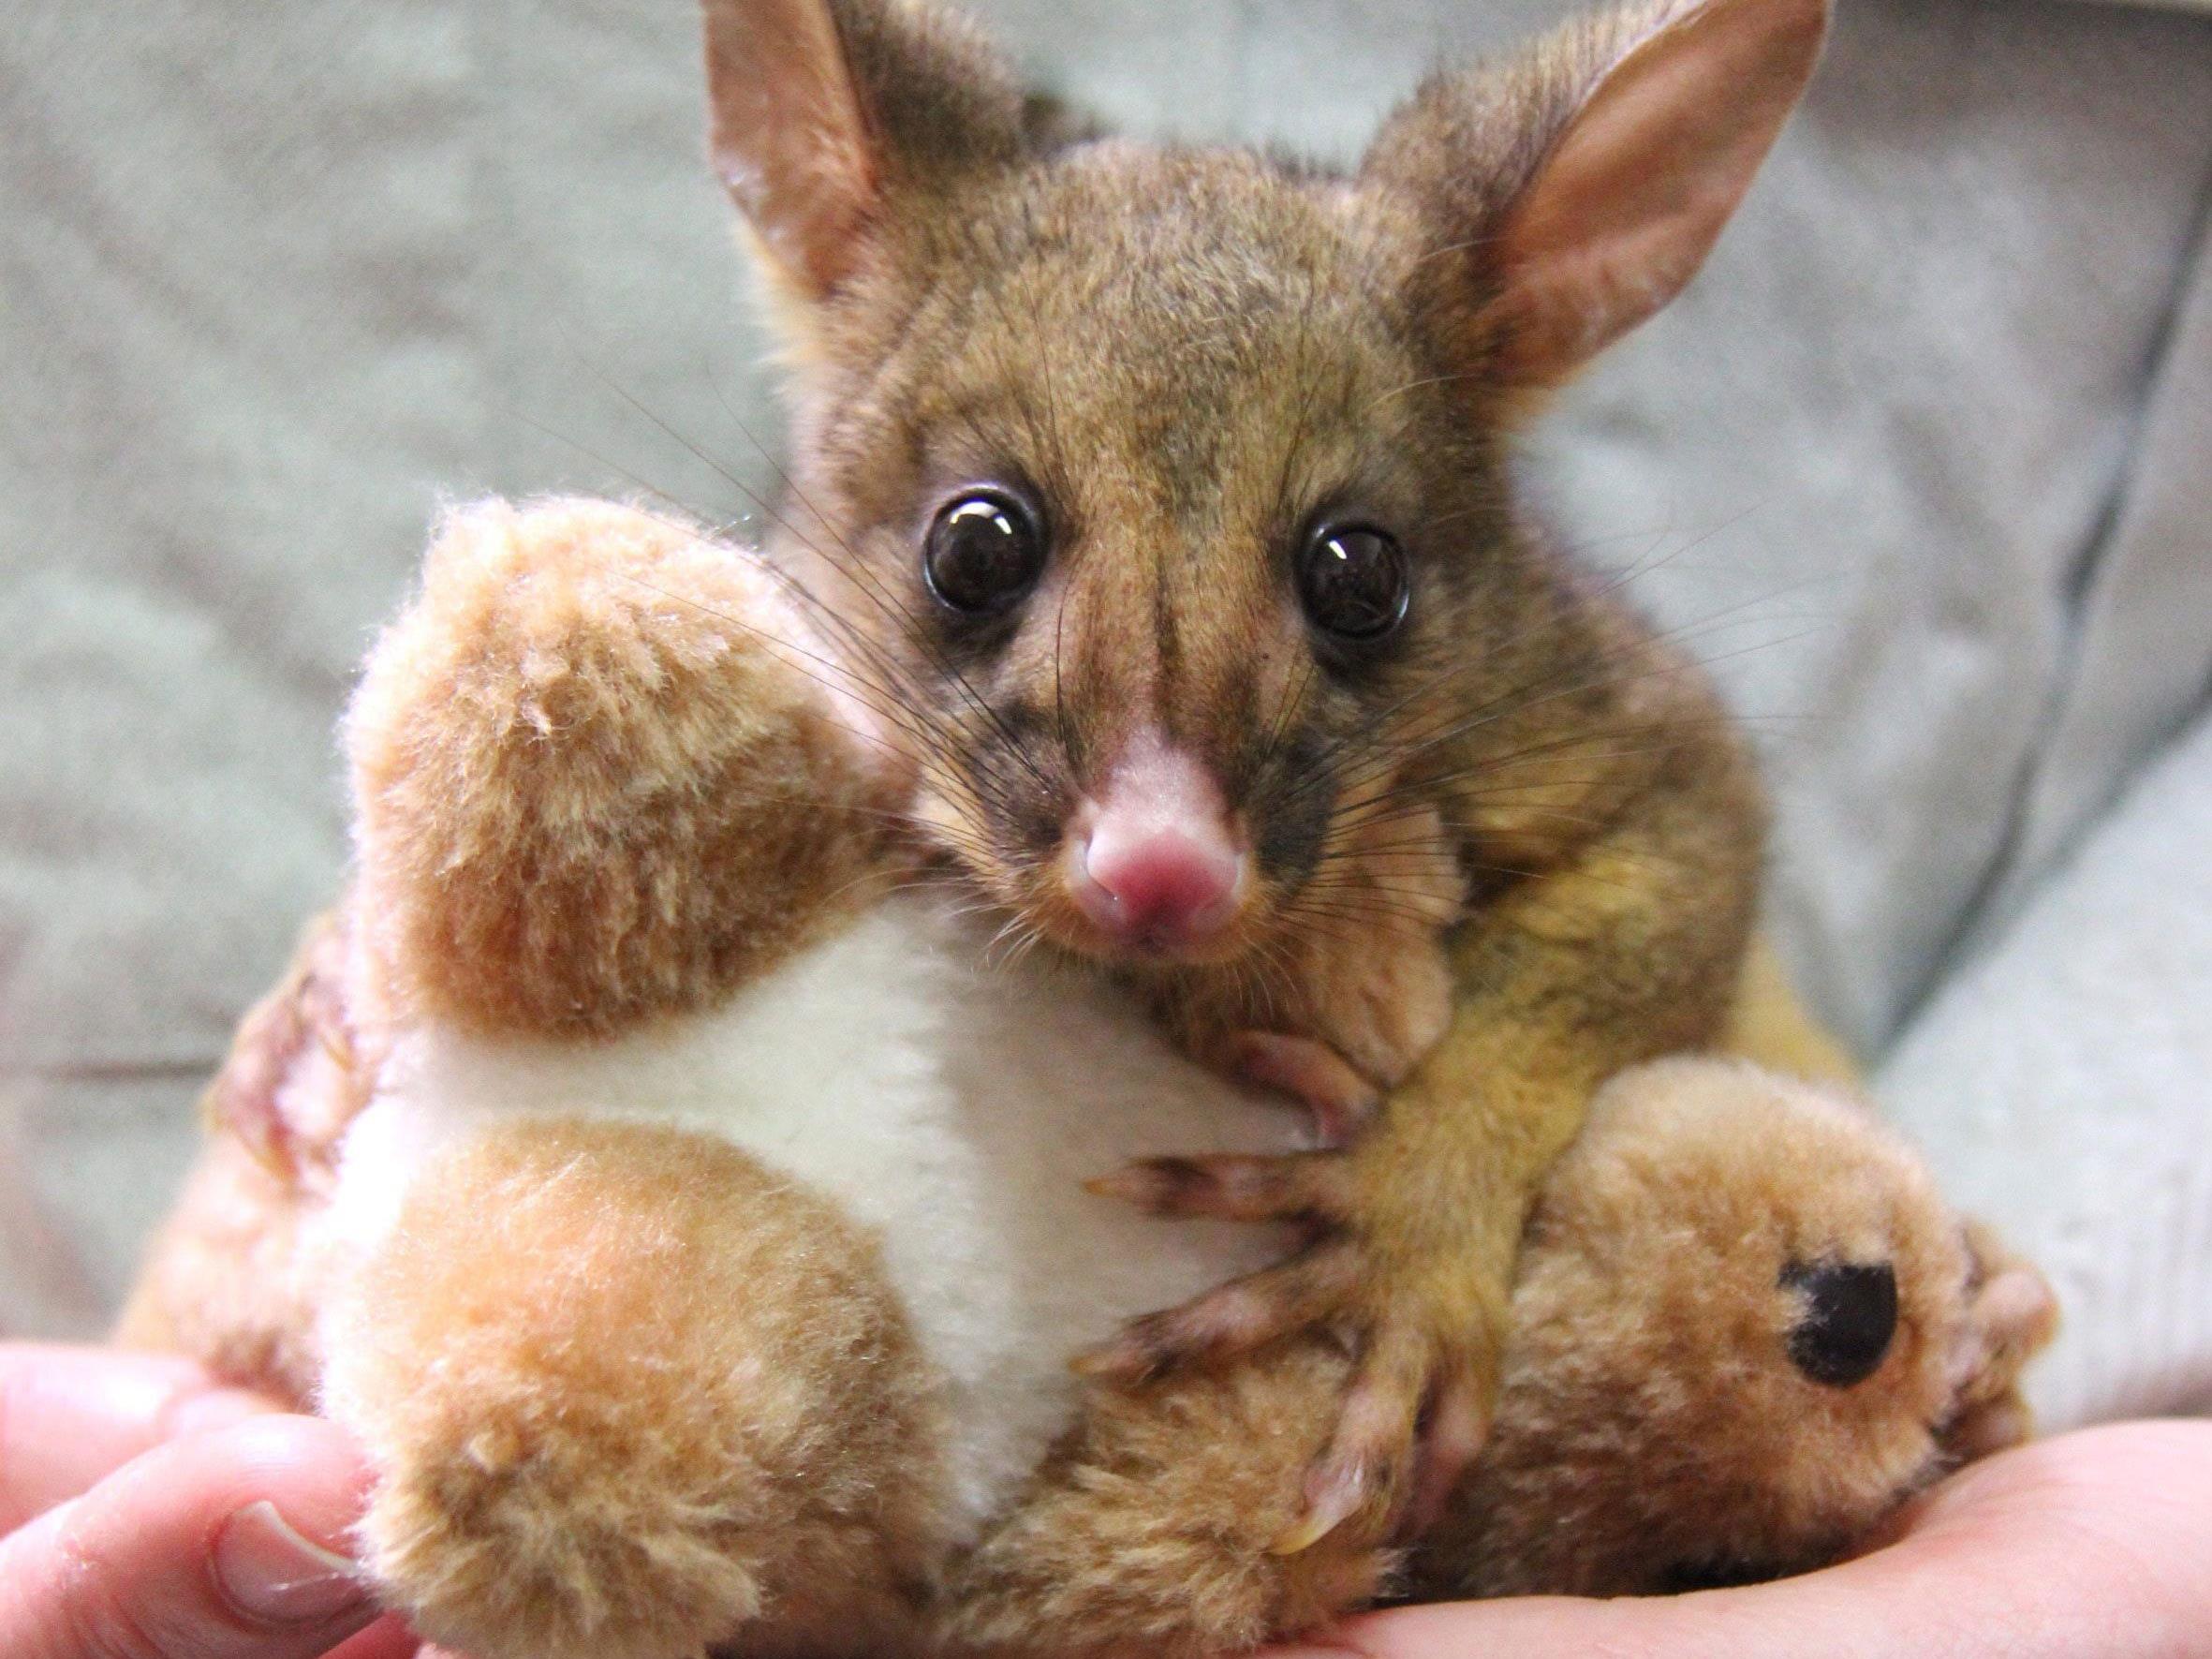 Verwaistes Beuteltier-Baby kuschelt sich an Plüsch-Känguru